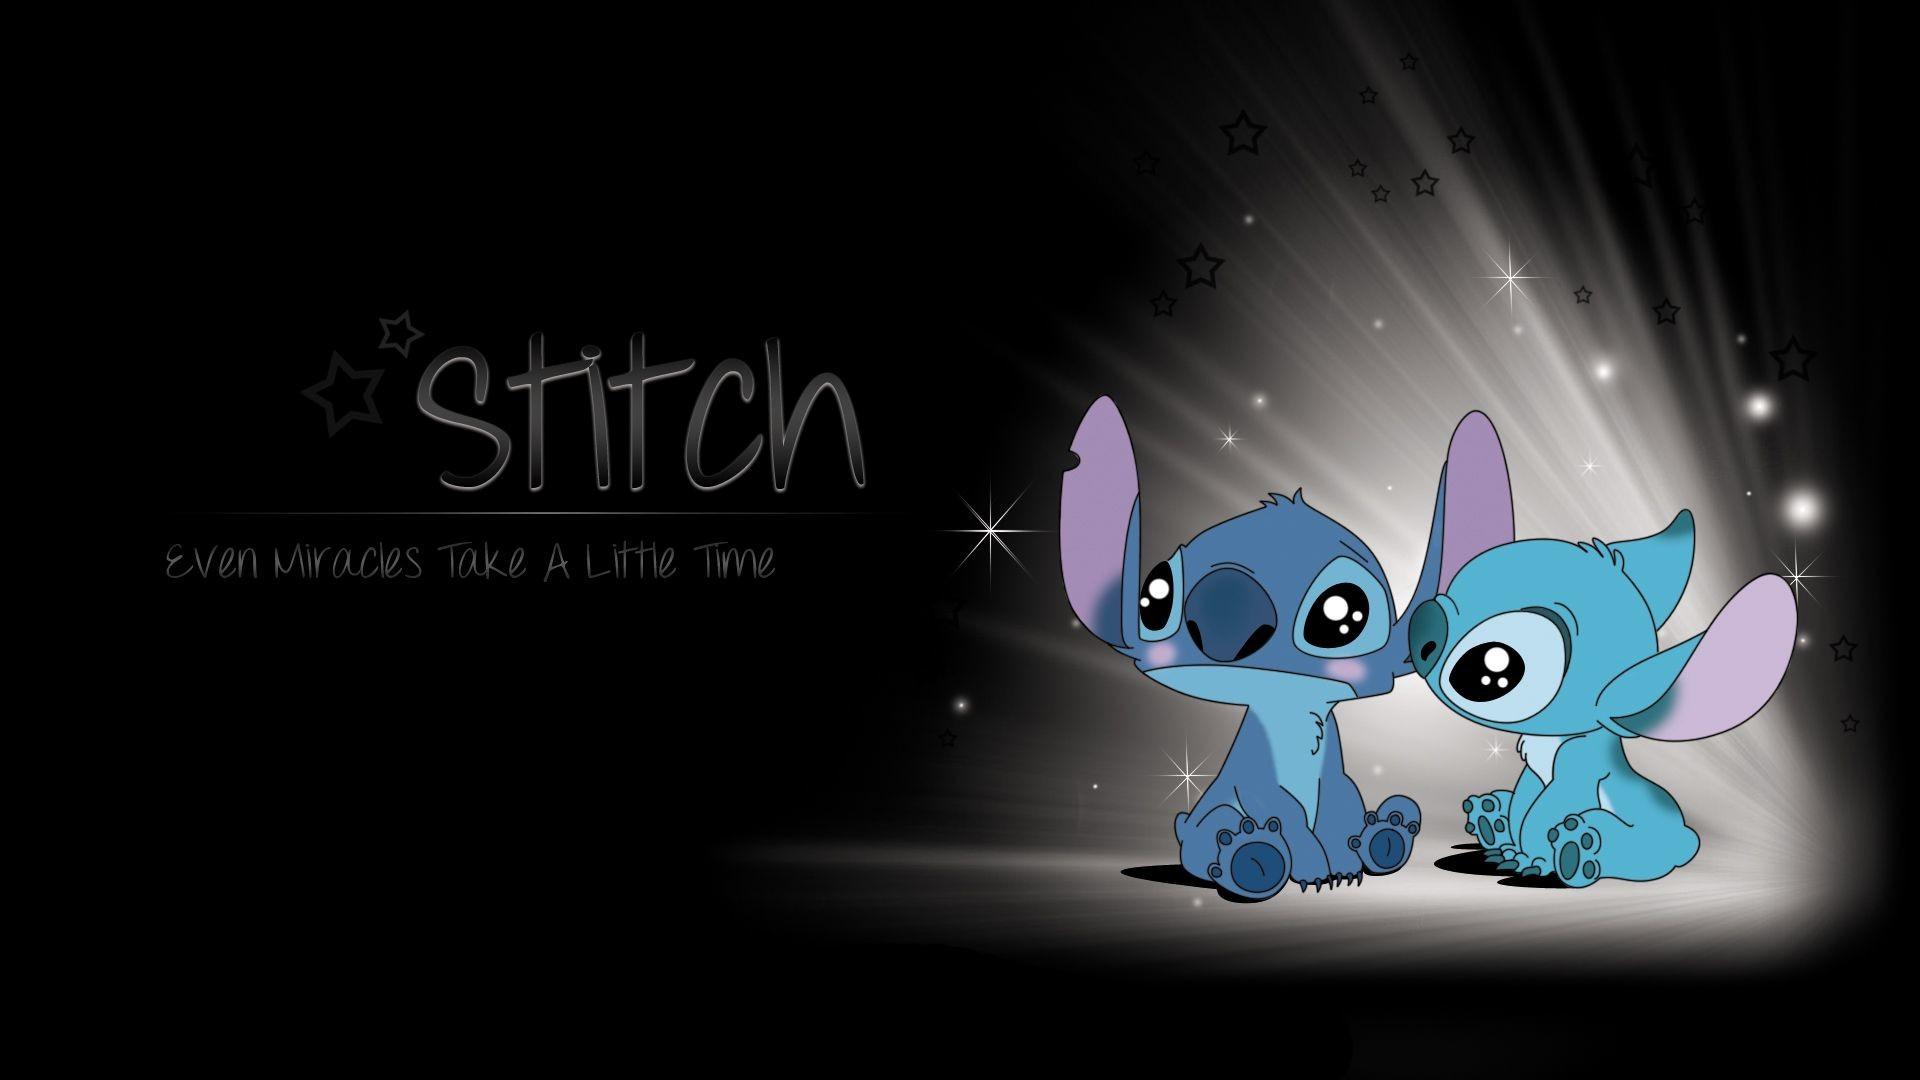 Cute stitch wallpaper HD Desktop download stitch backgrounds